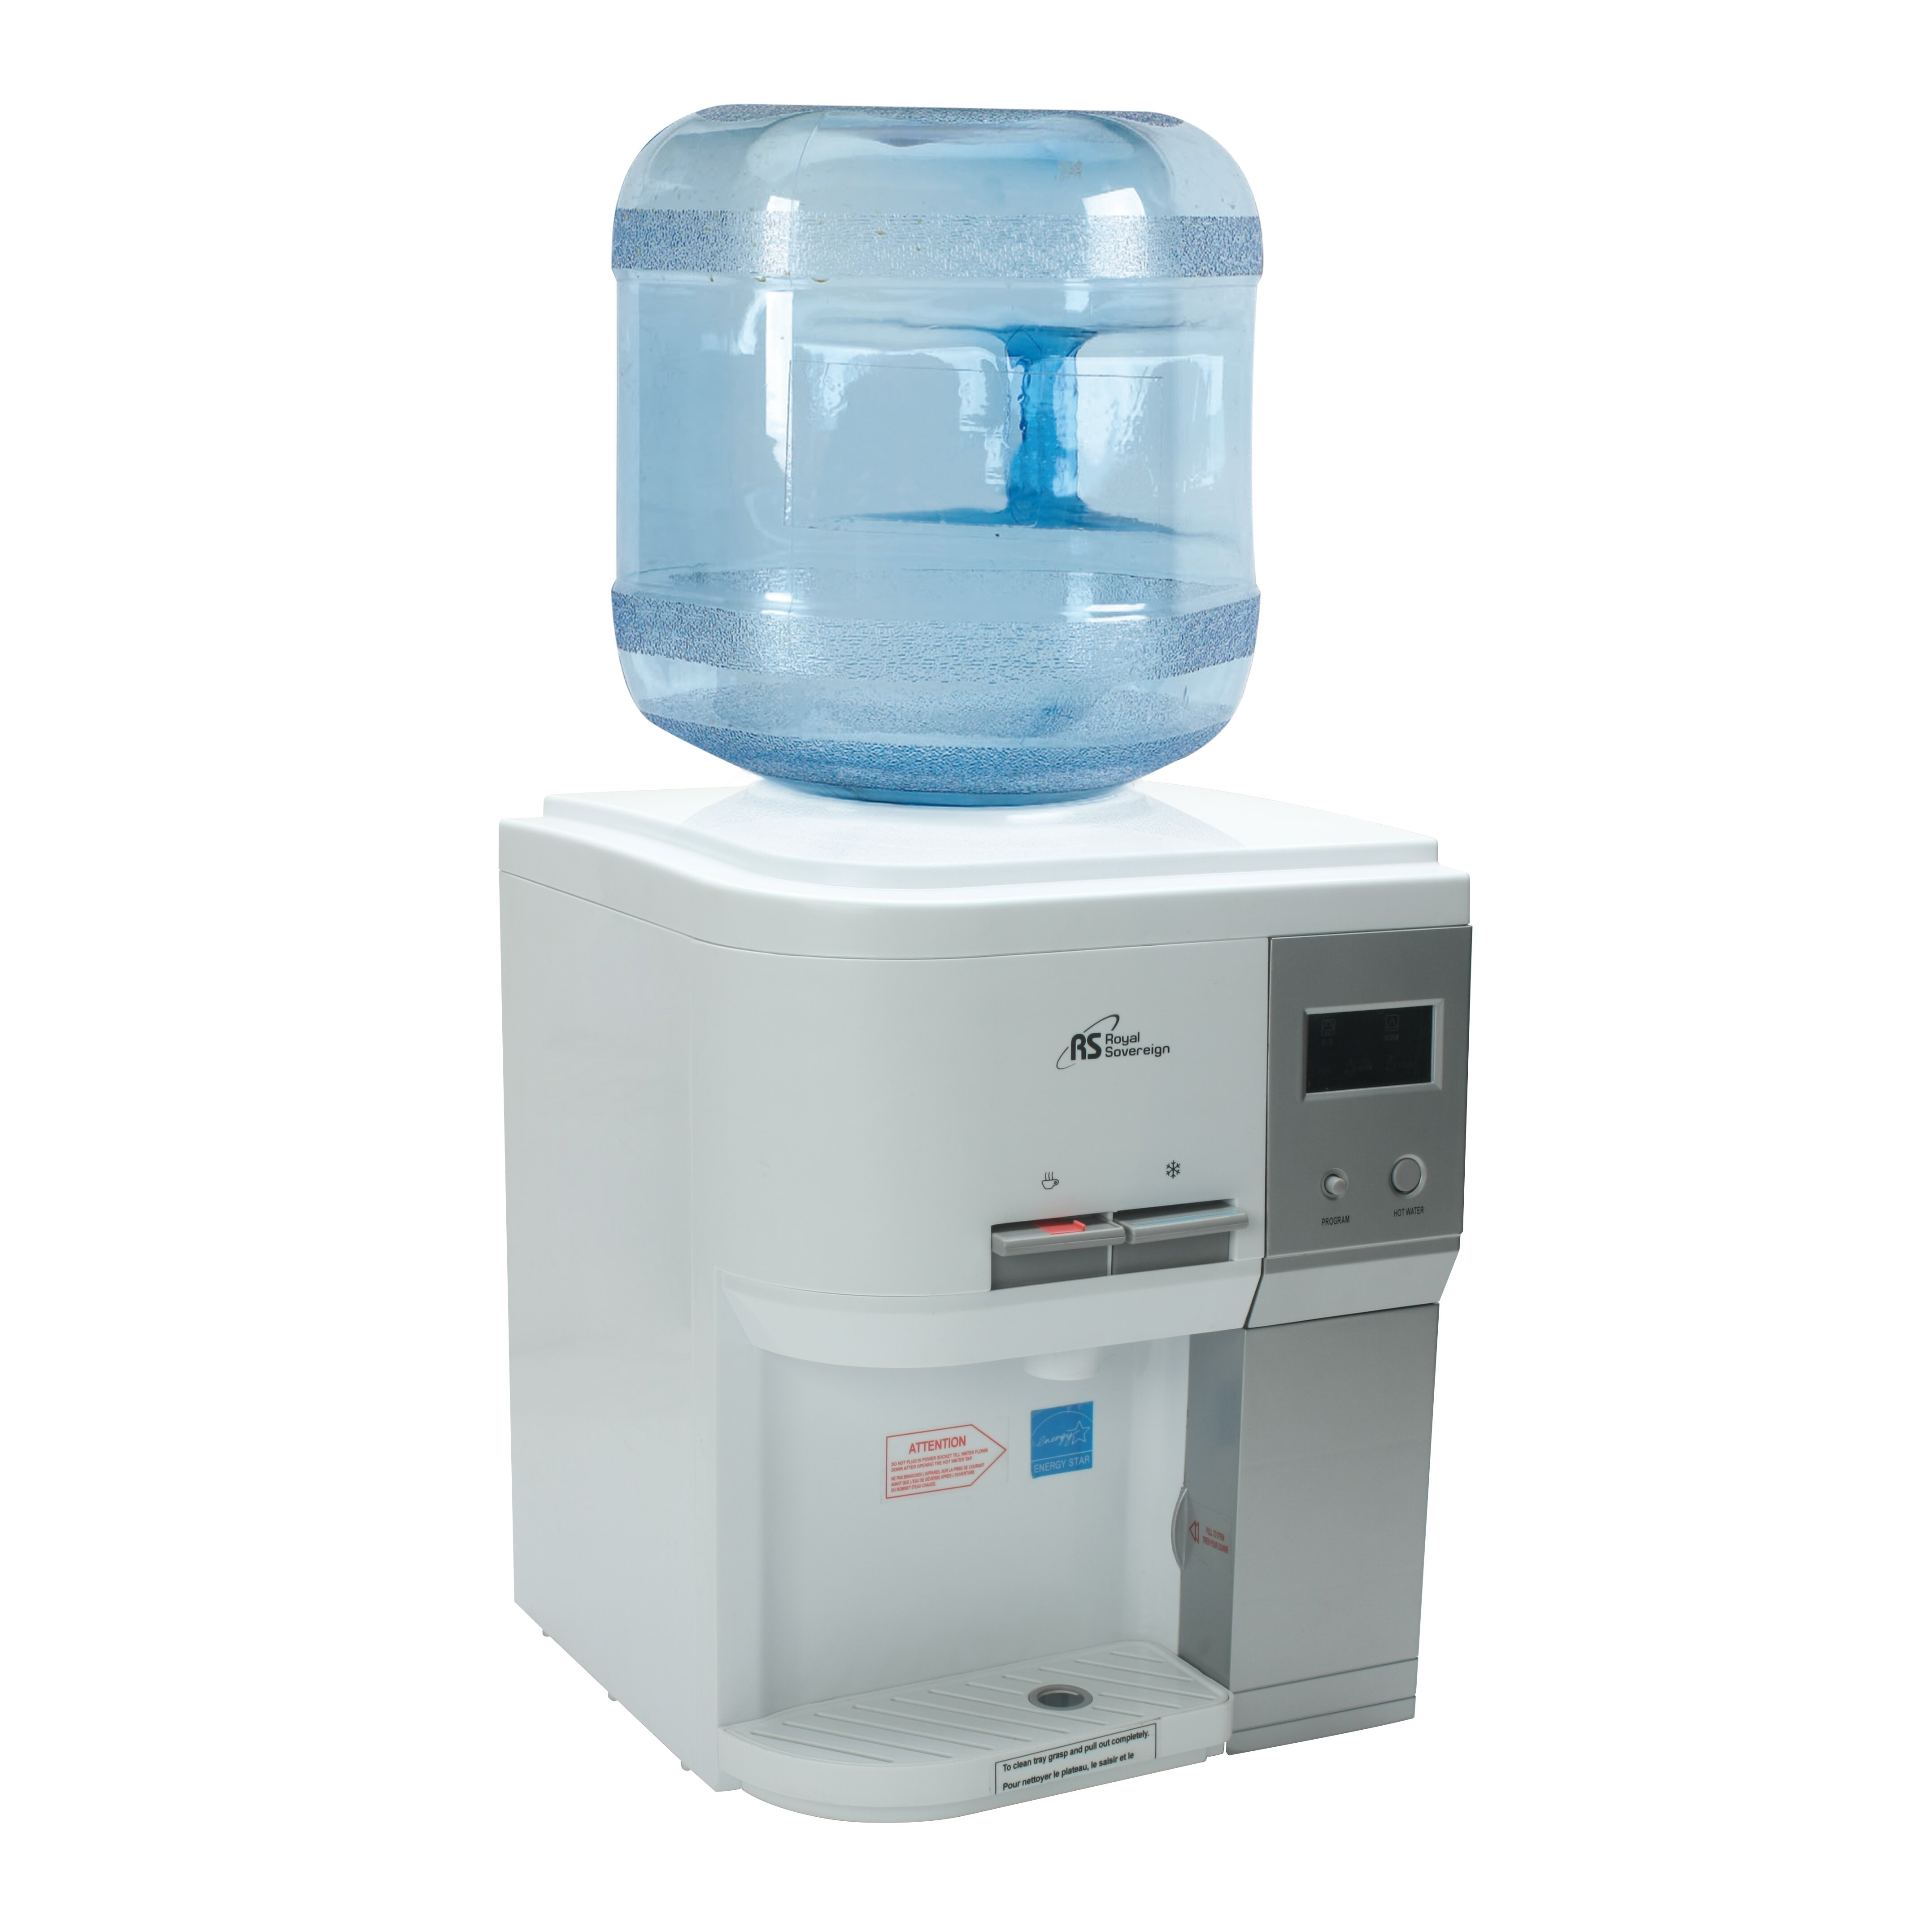 ... Intl Inc Countertop Hot/Cold and Room Temperature Water Dispenser